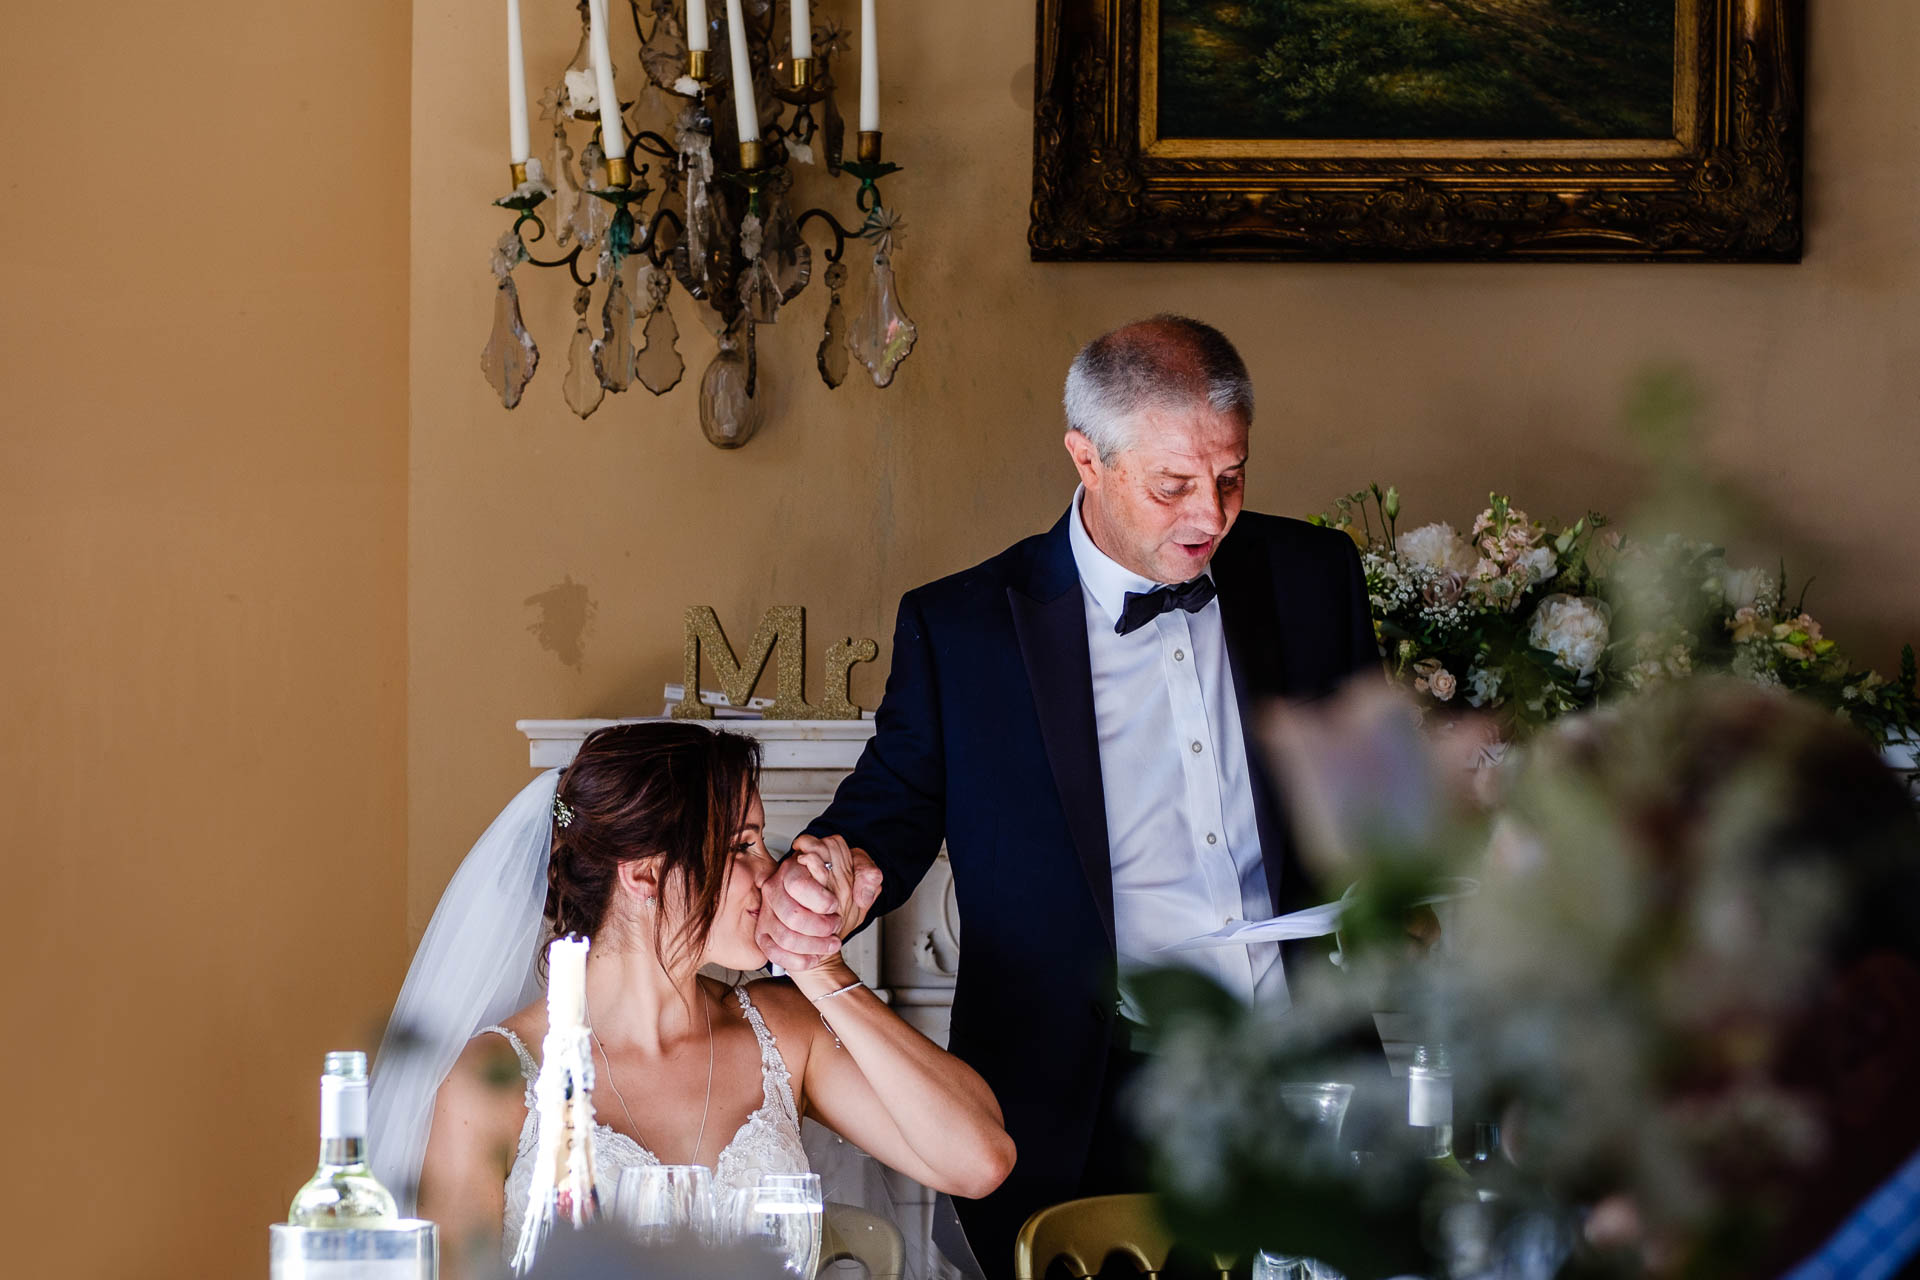 orchardleigh house wedding - Danni & Barney (342).jpg